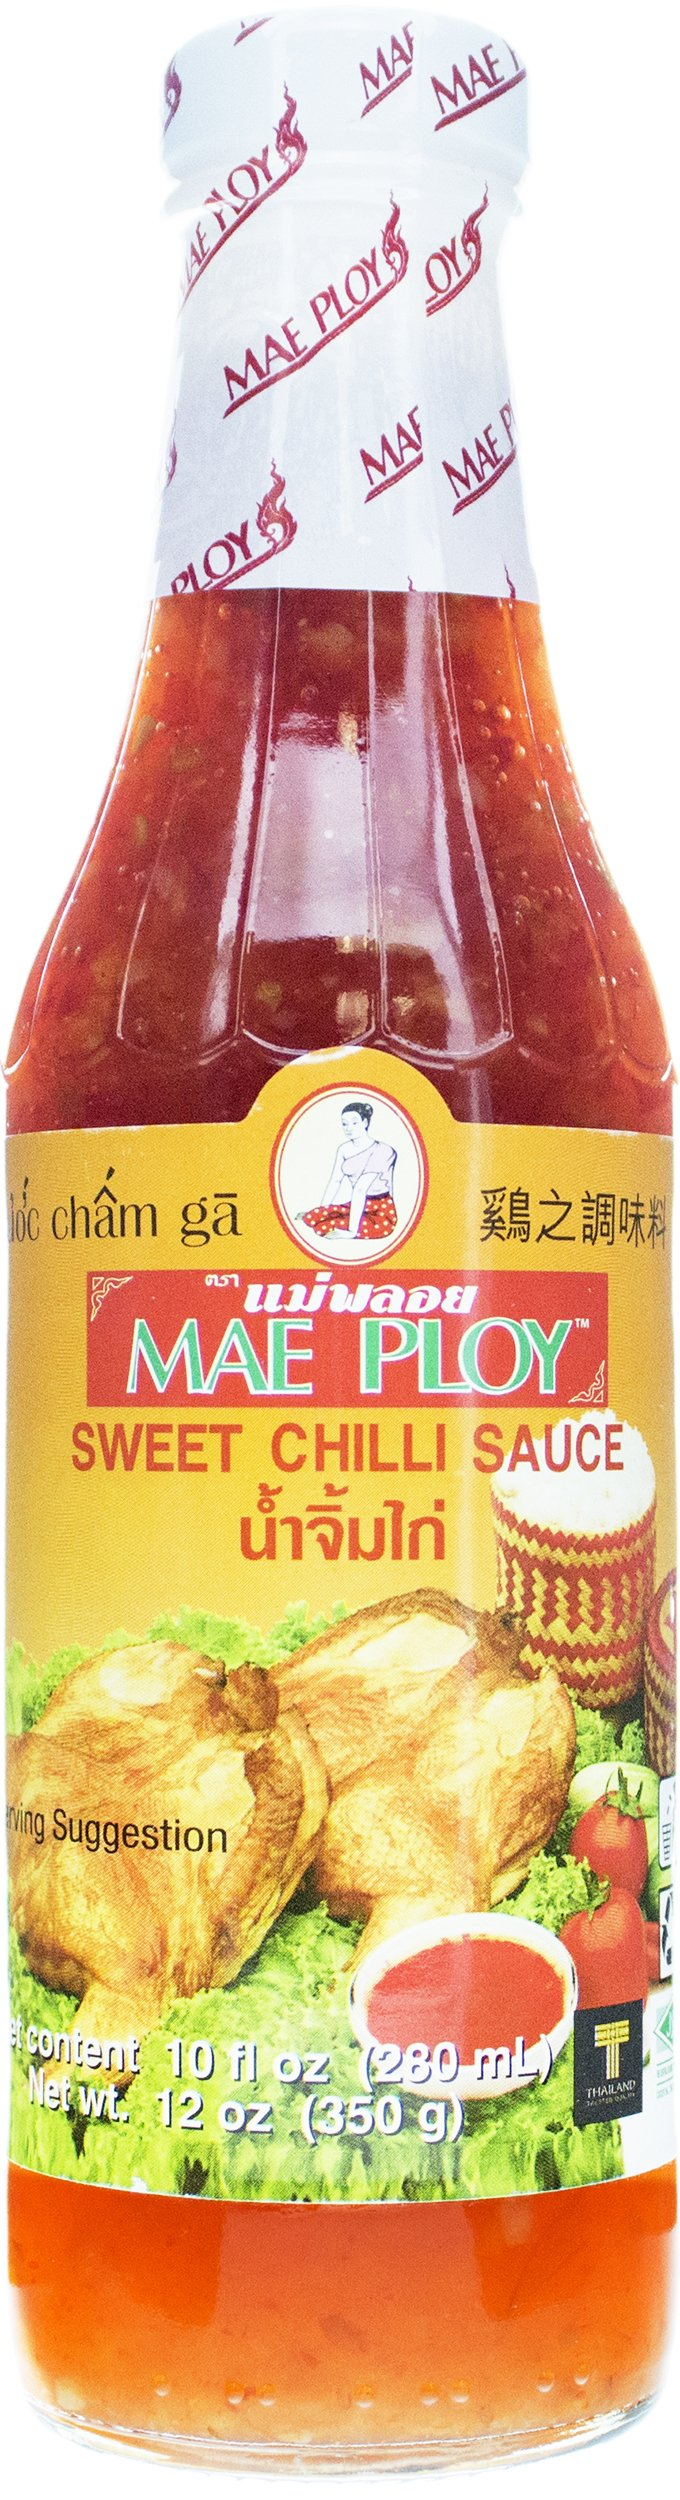 Mae Ploy Sweet Chili Sauce, 12 oz